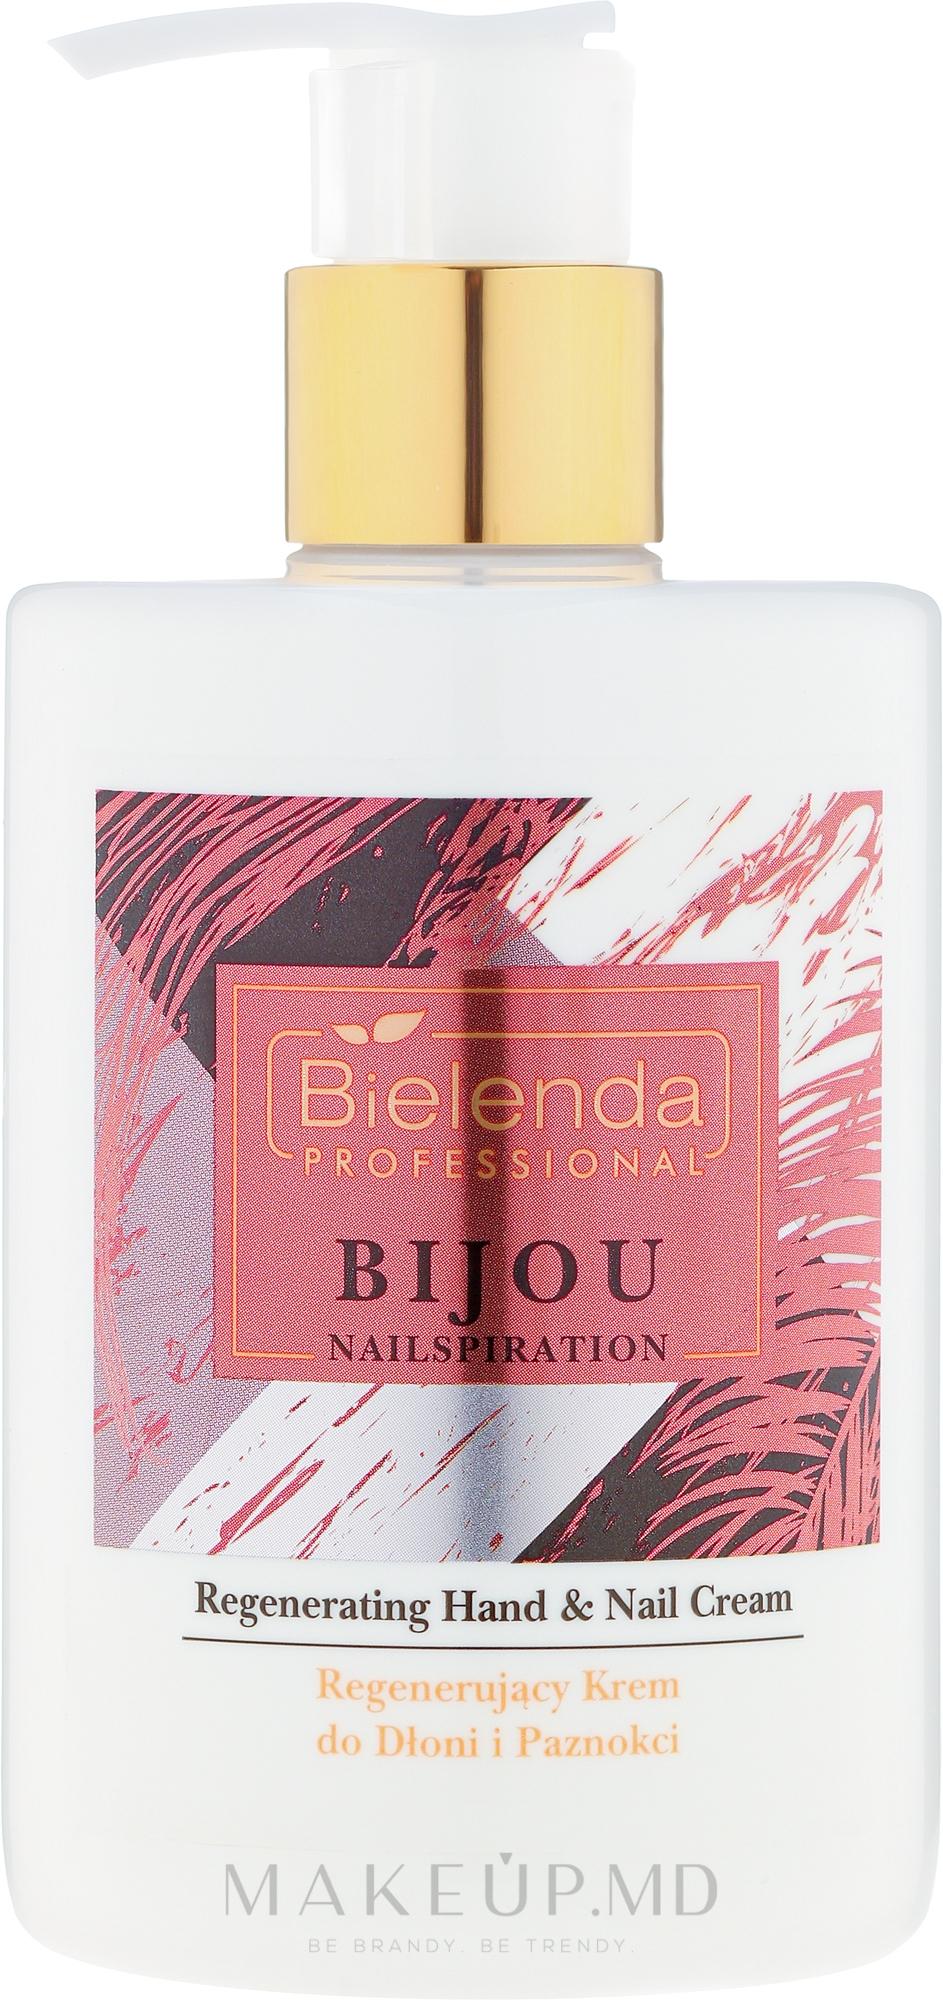 Cremă pentru mâini și unghii - Bielenda Professional Nailspiration Bijou Regenerating Hand & Nail Cream — Imagine 300 ml